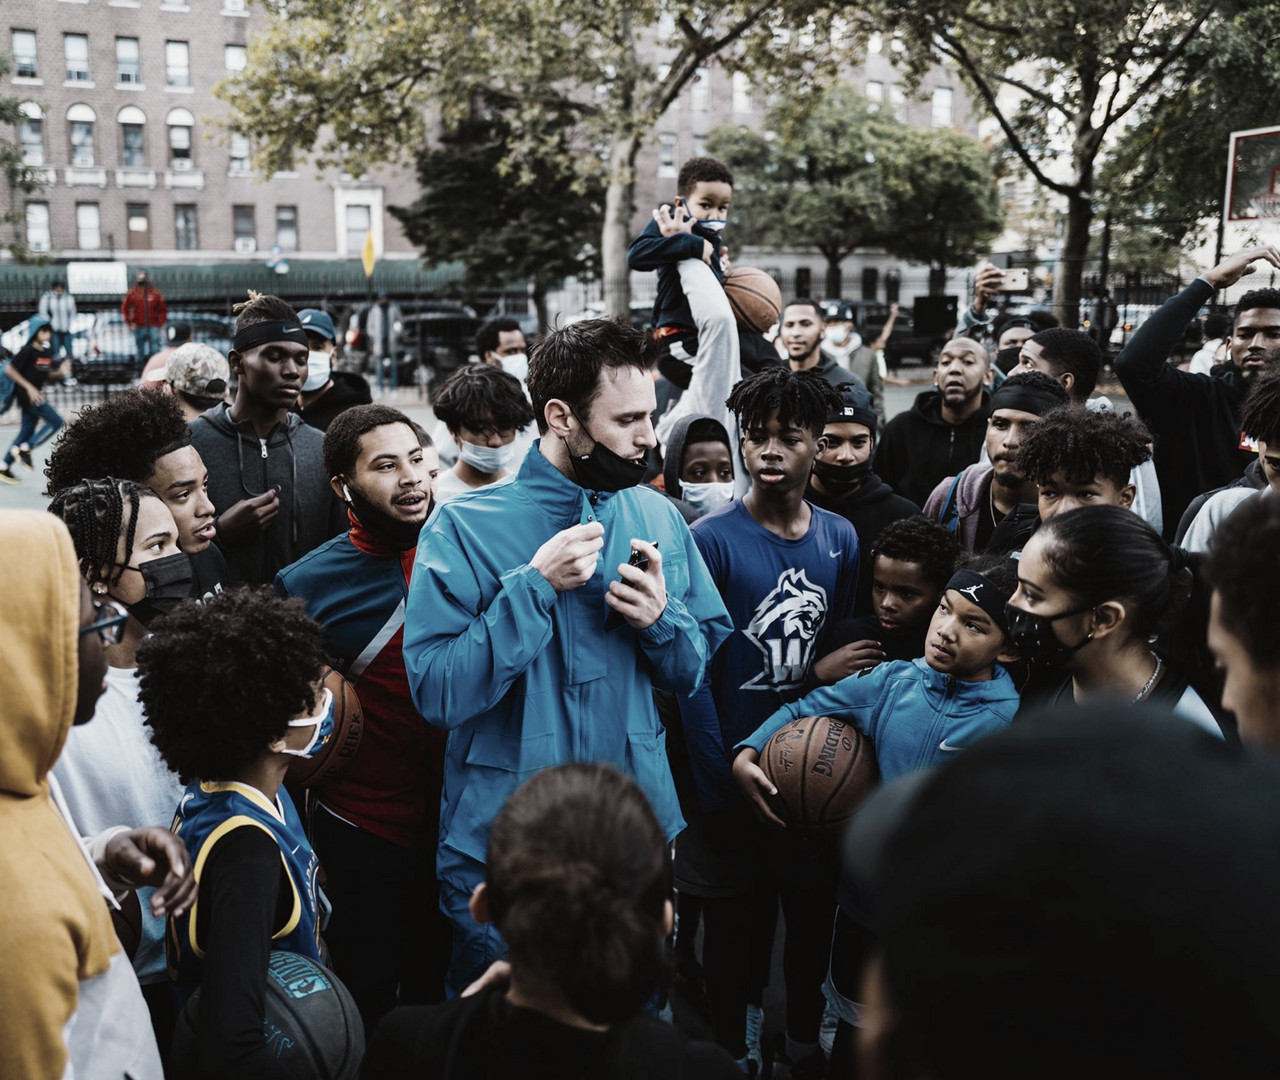 Brickley Organizes Basketball Camp in Washington Heights